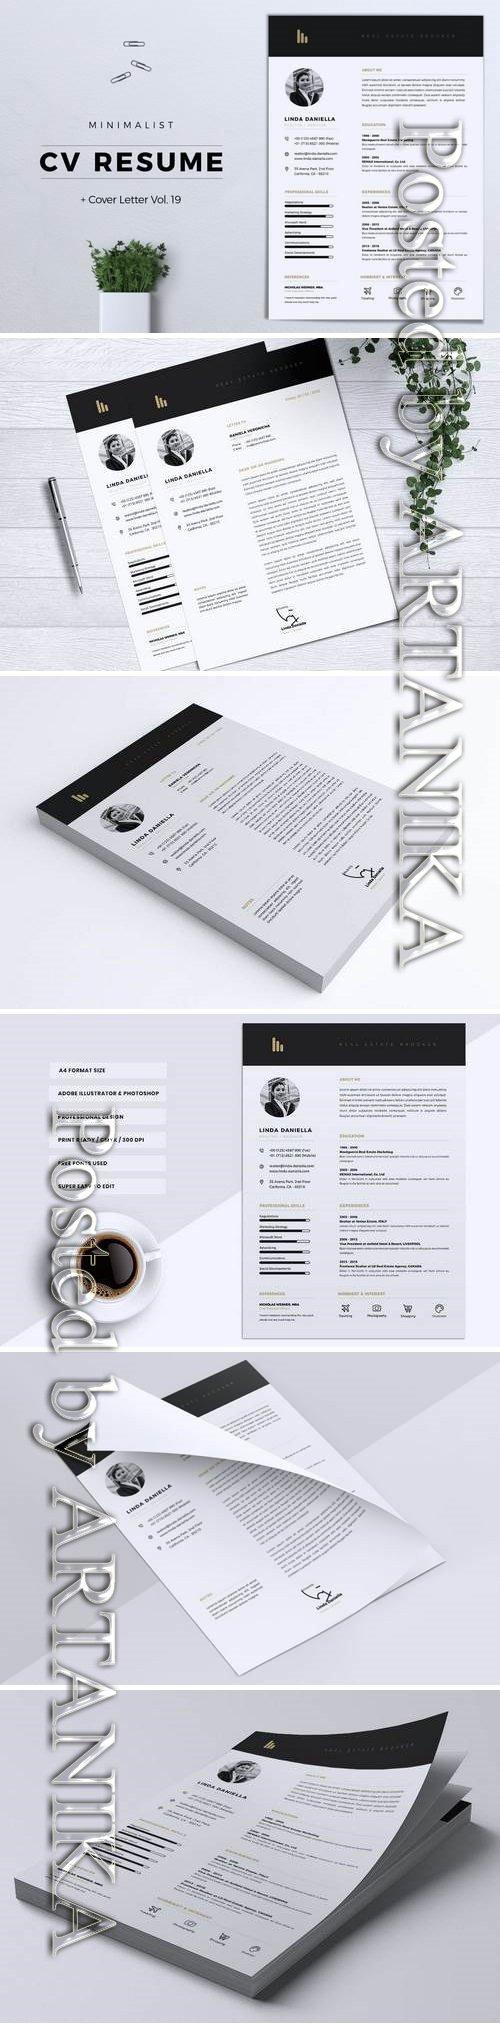 Minimalist CV Resume Vol. 19